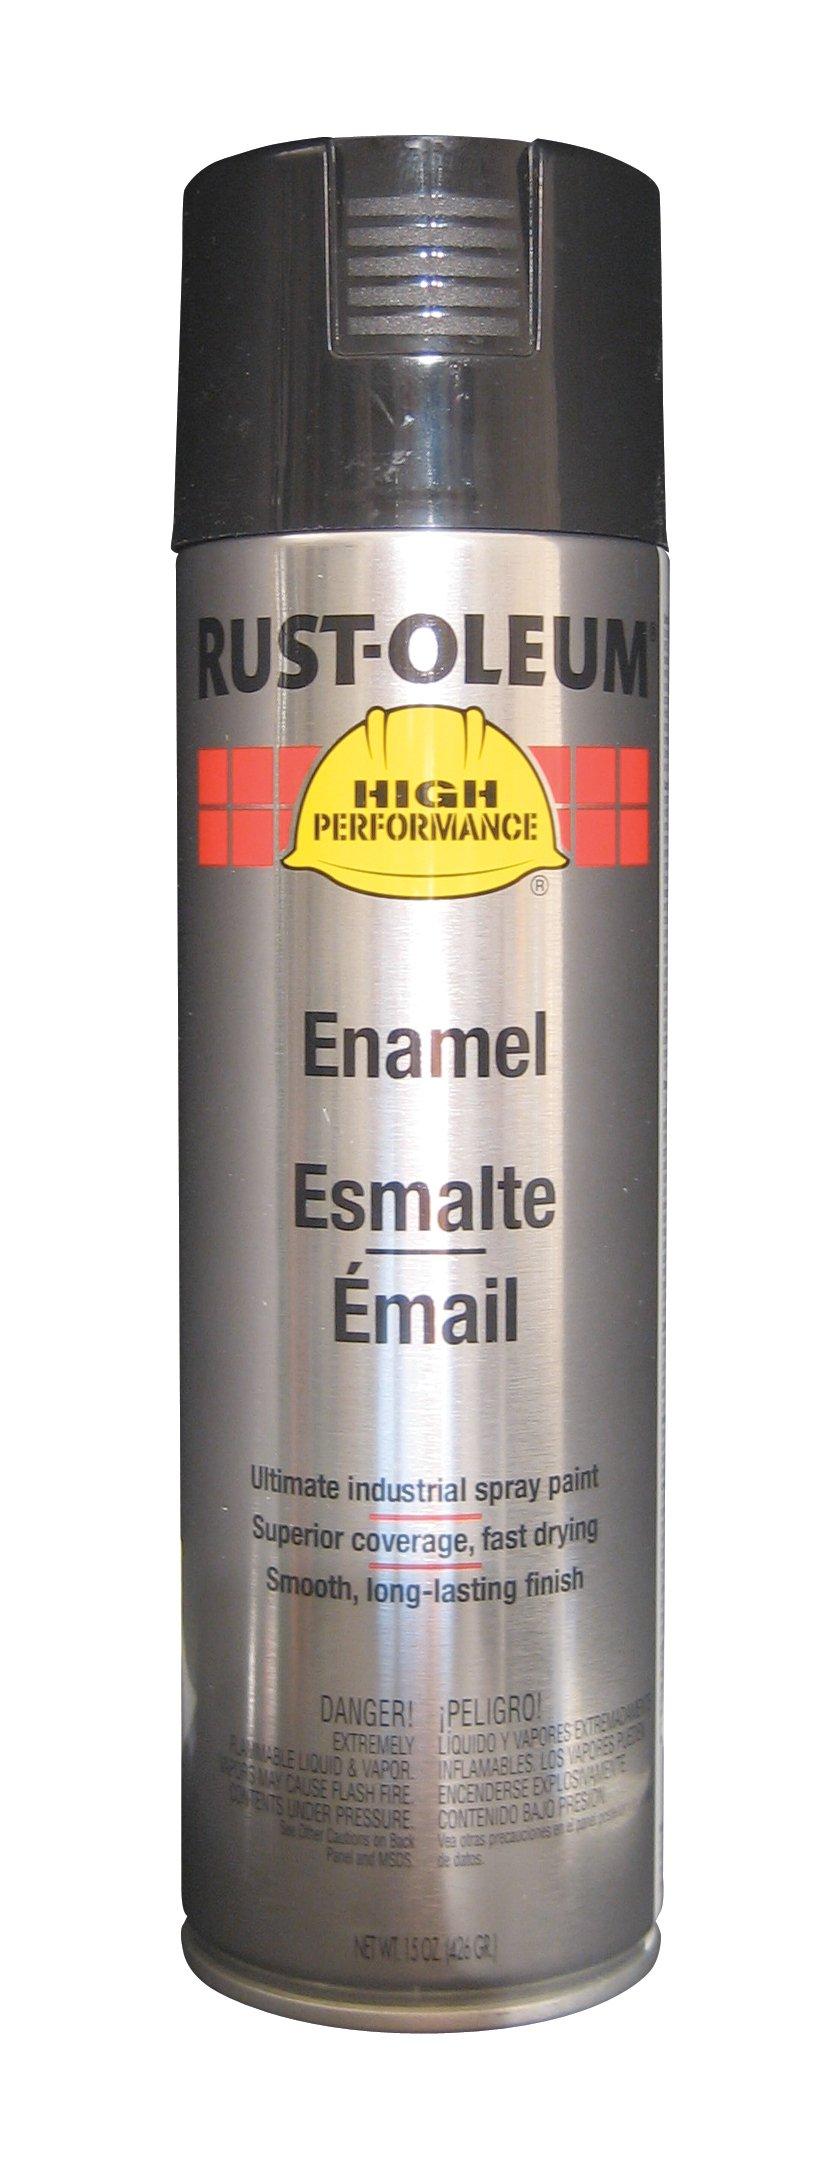 Rust-Oleum V2179838 High Performance V2100 System Rust Preventive Enamel Spray Paint,  20 fl. oz. container, 15 oz. fill,, Black, 6-Pack